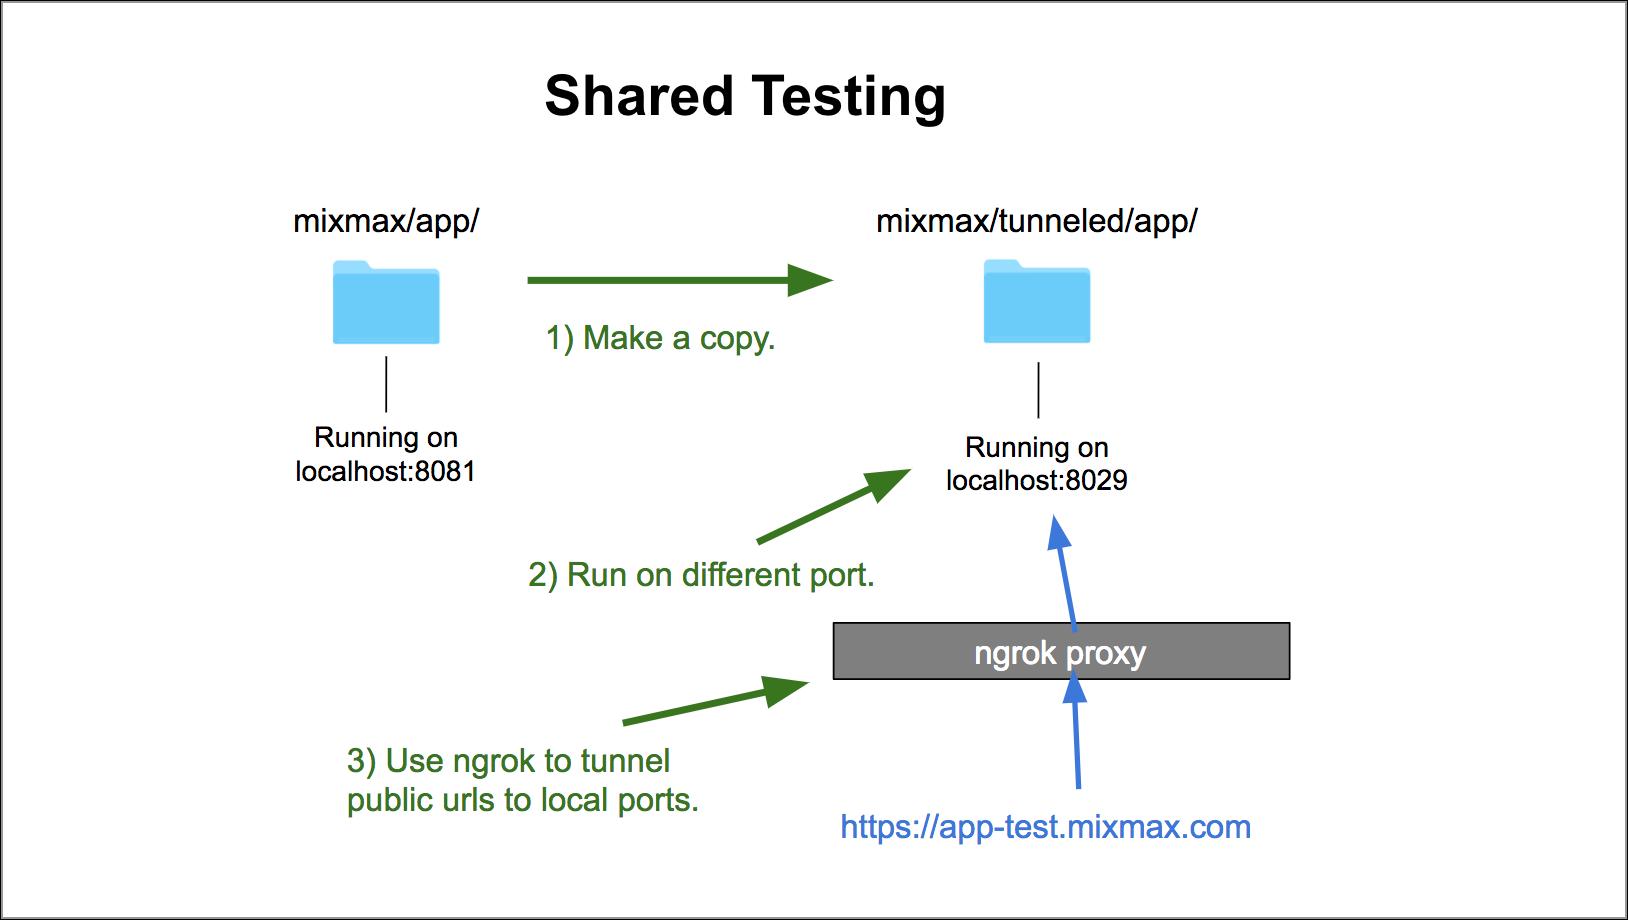 Shared Testing